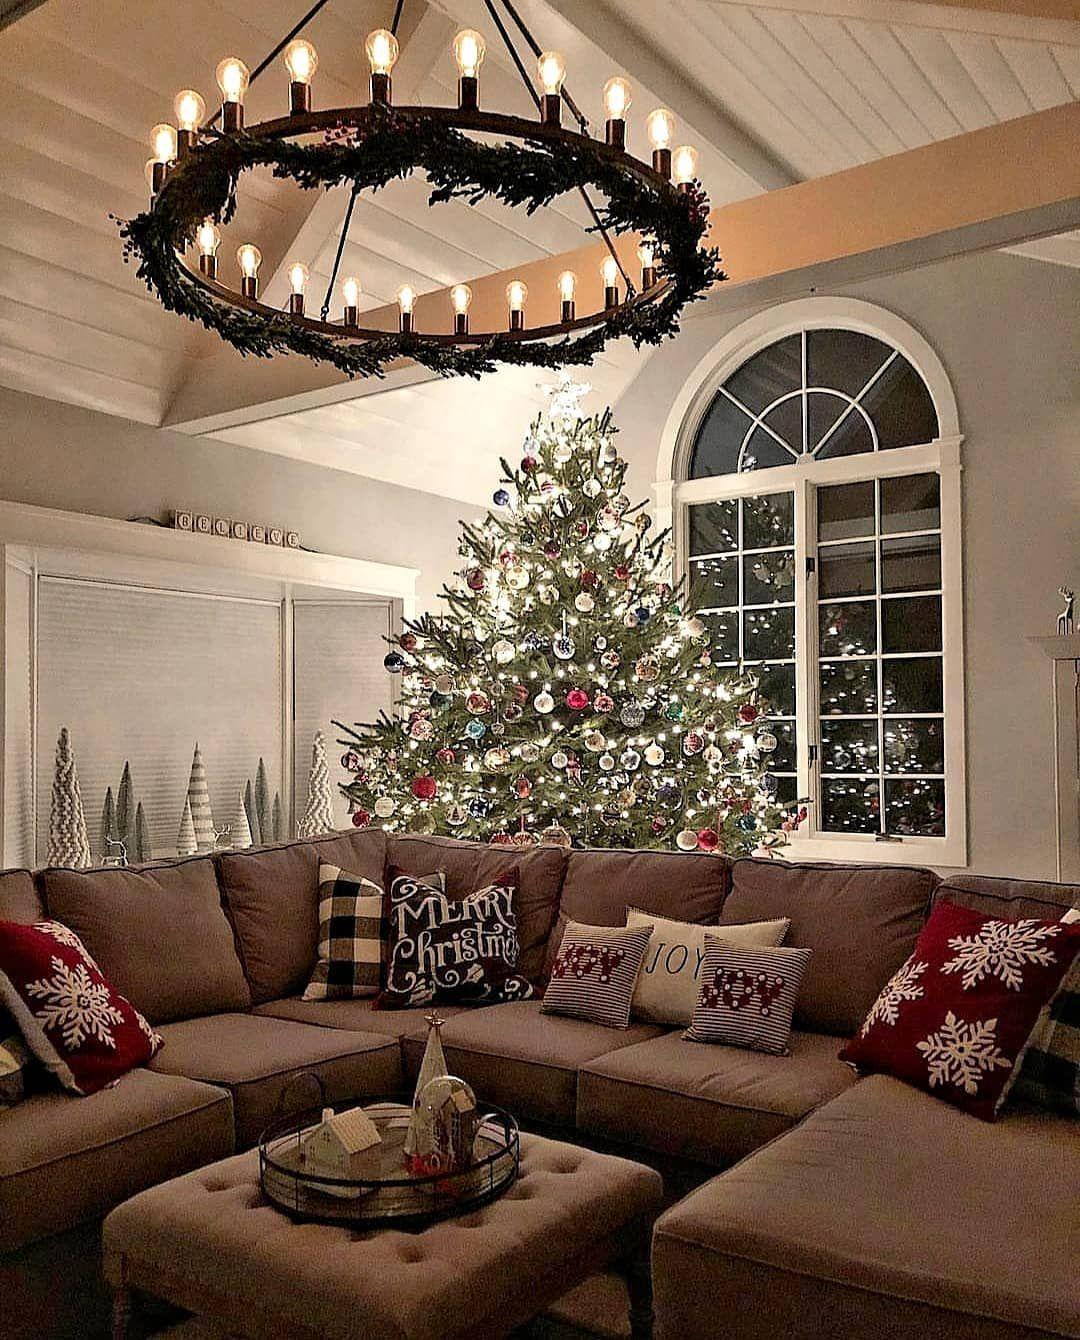 Christmassgram on Instagram:  #christmas #xmas #winter #hotchocolate #marshmallow #christmasgram #christmastree #christmastime #christmasmood #christmasspirit